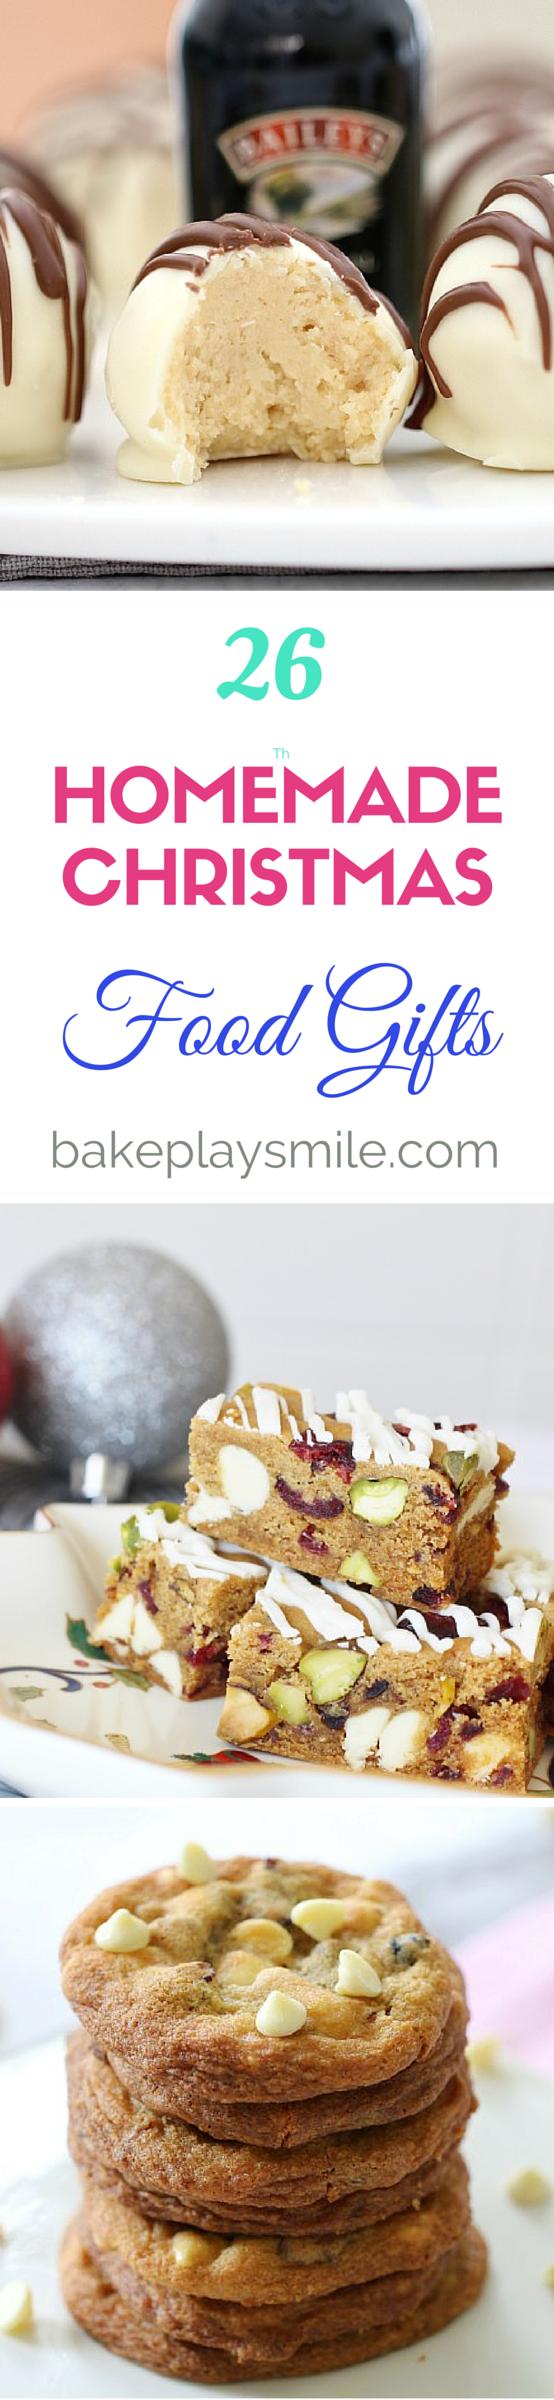 Homemade Christmas Food Gifts   Pinterest   Food gifts, Diy food ...